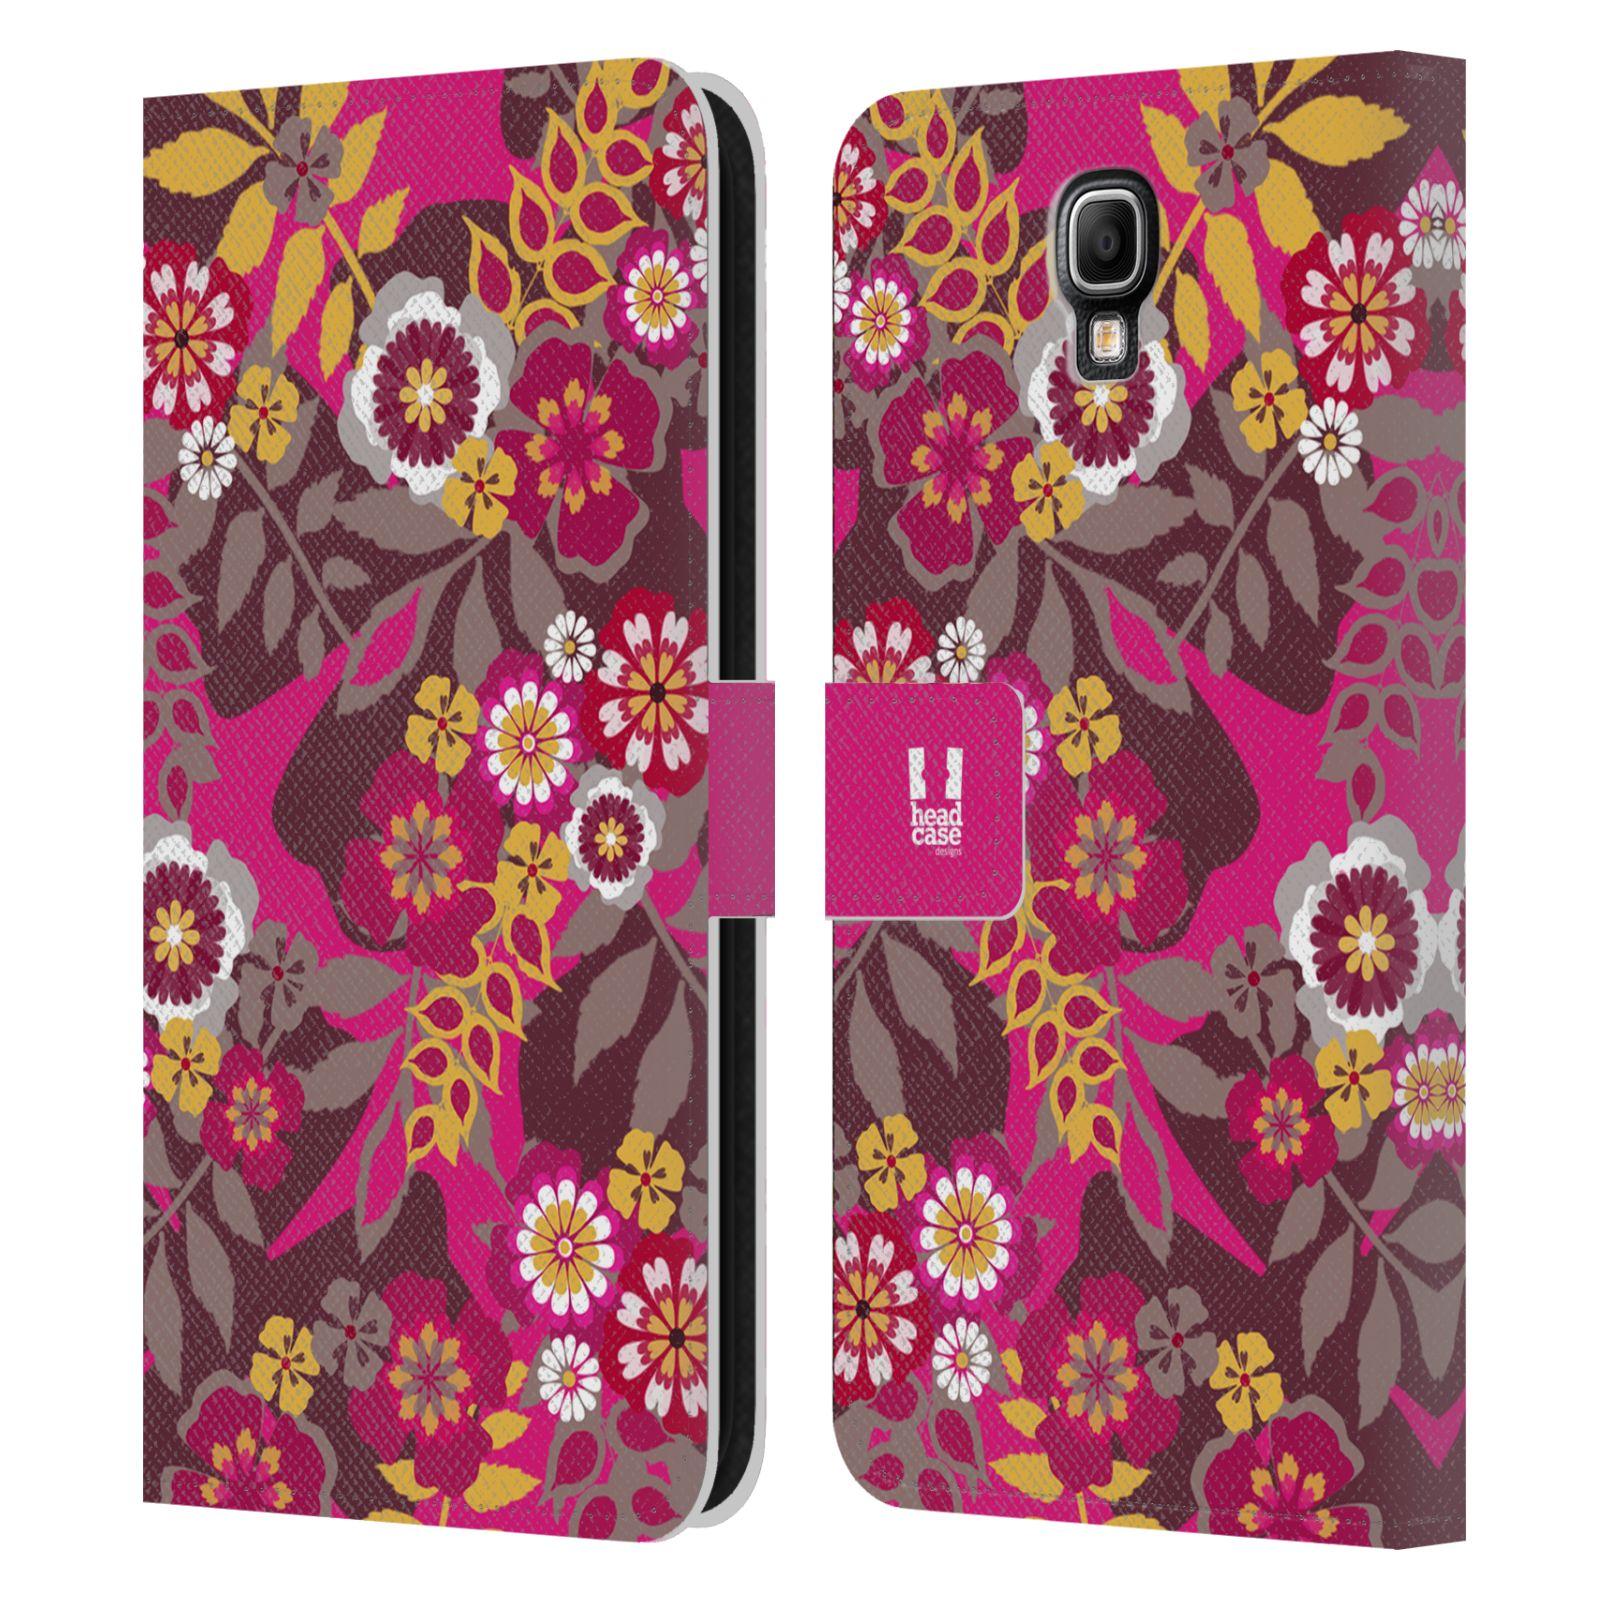 HEAD CASE Flipové pouzdro pro mobil Samsung Galaxy Note 3 NEO (N7505) BOTANIKA růžová a hnědá